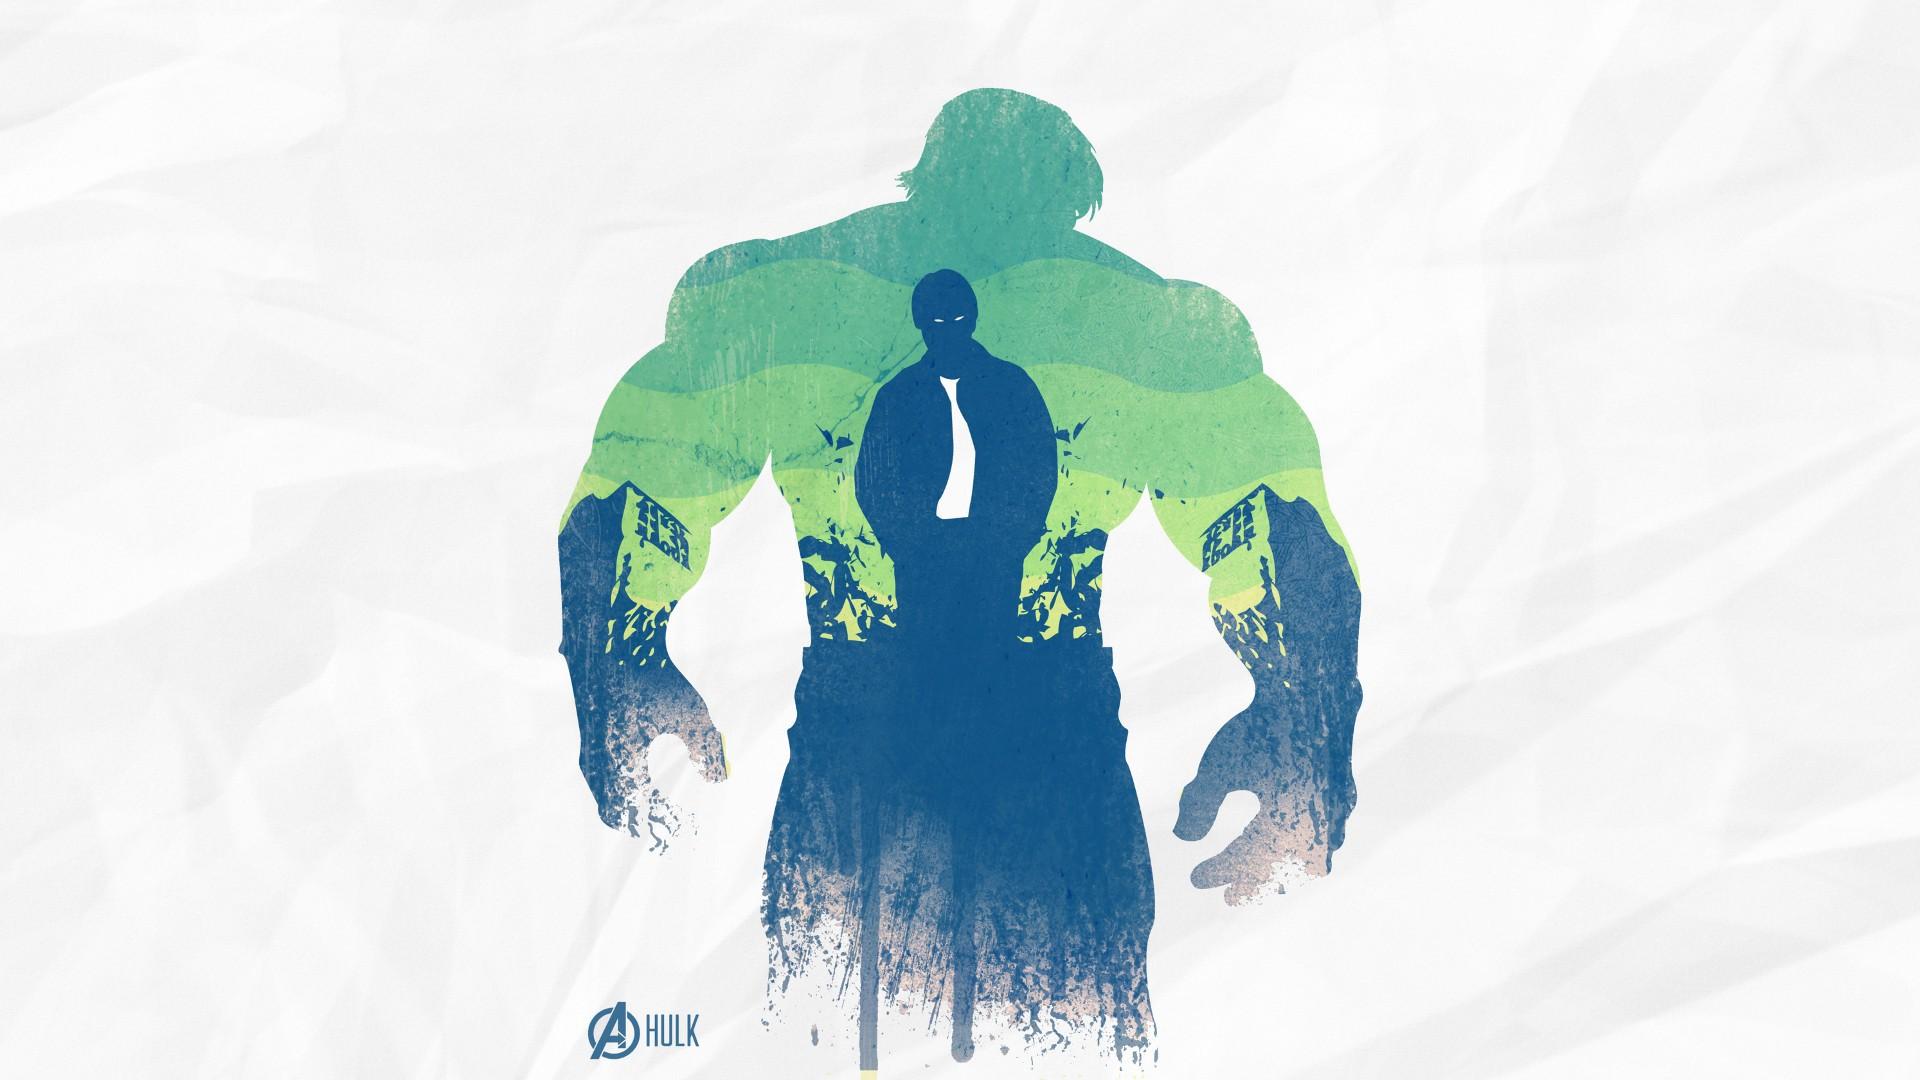 Hulk Full HD Wallpaper And Background Image